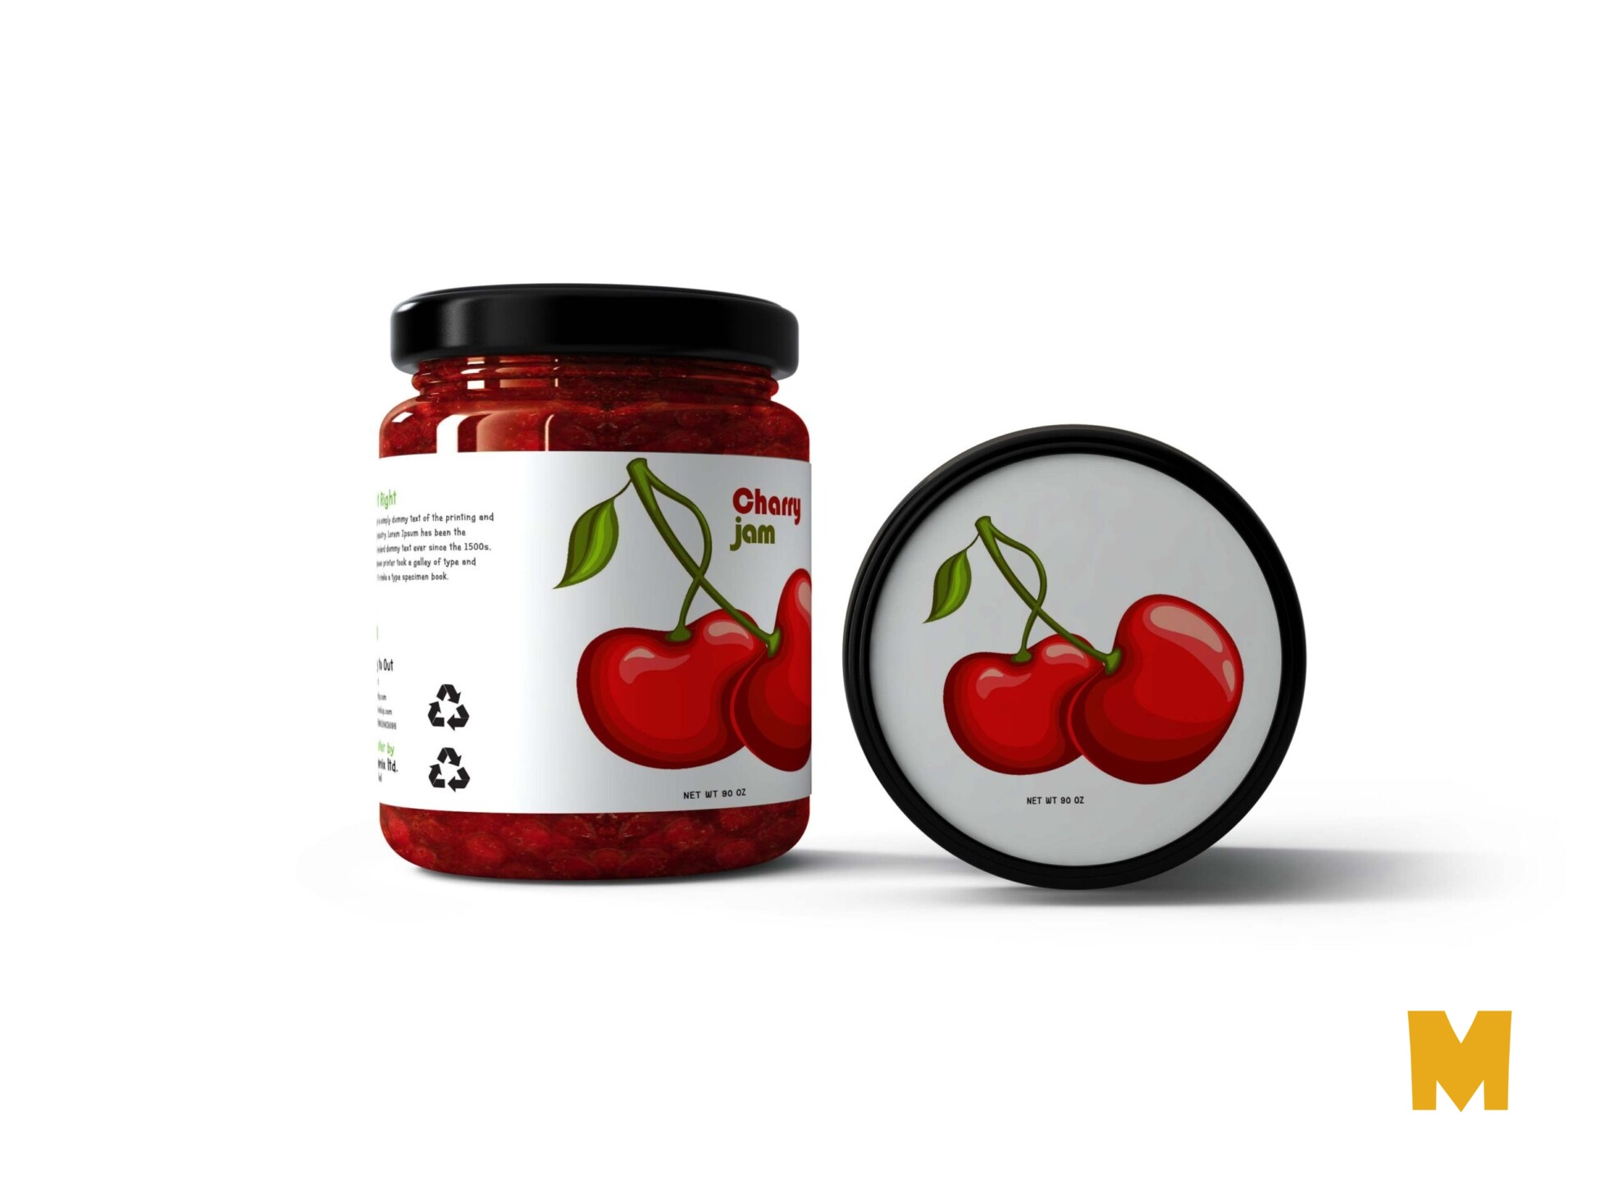 Premium Jelly Jar Mockup